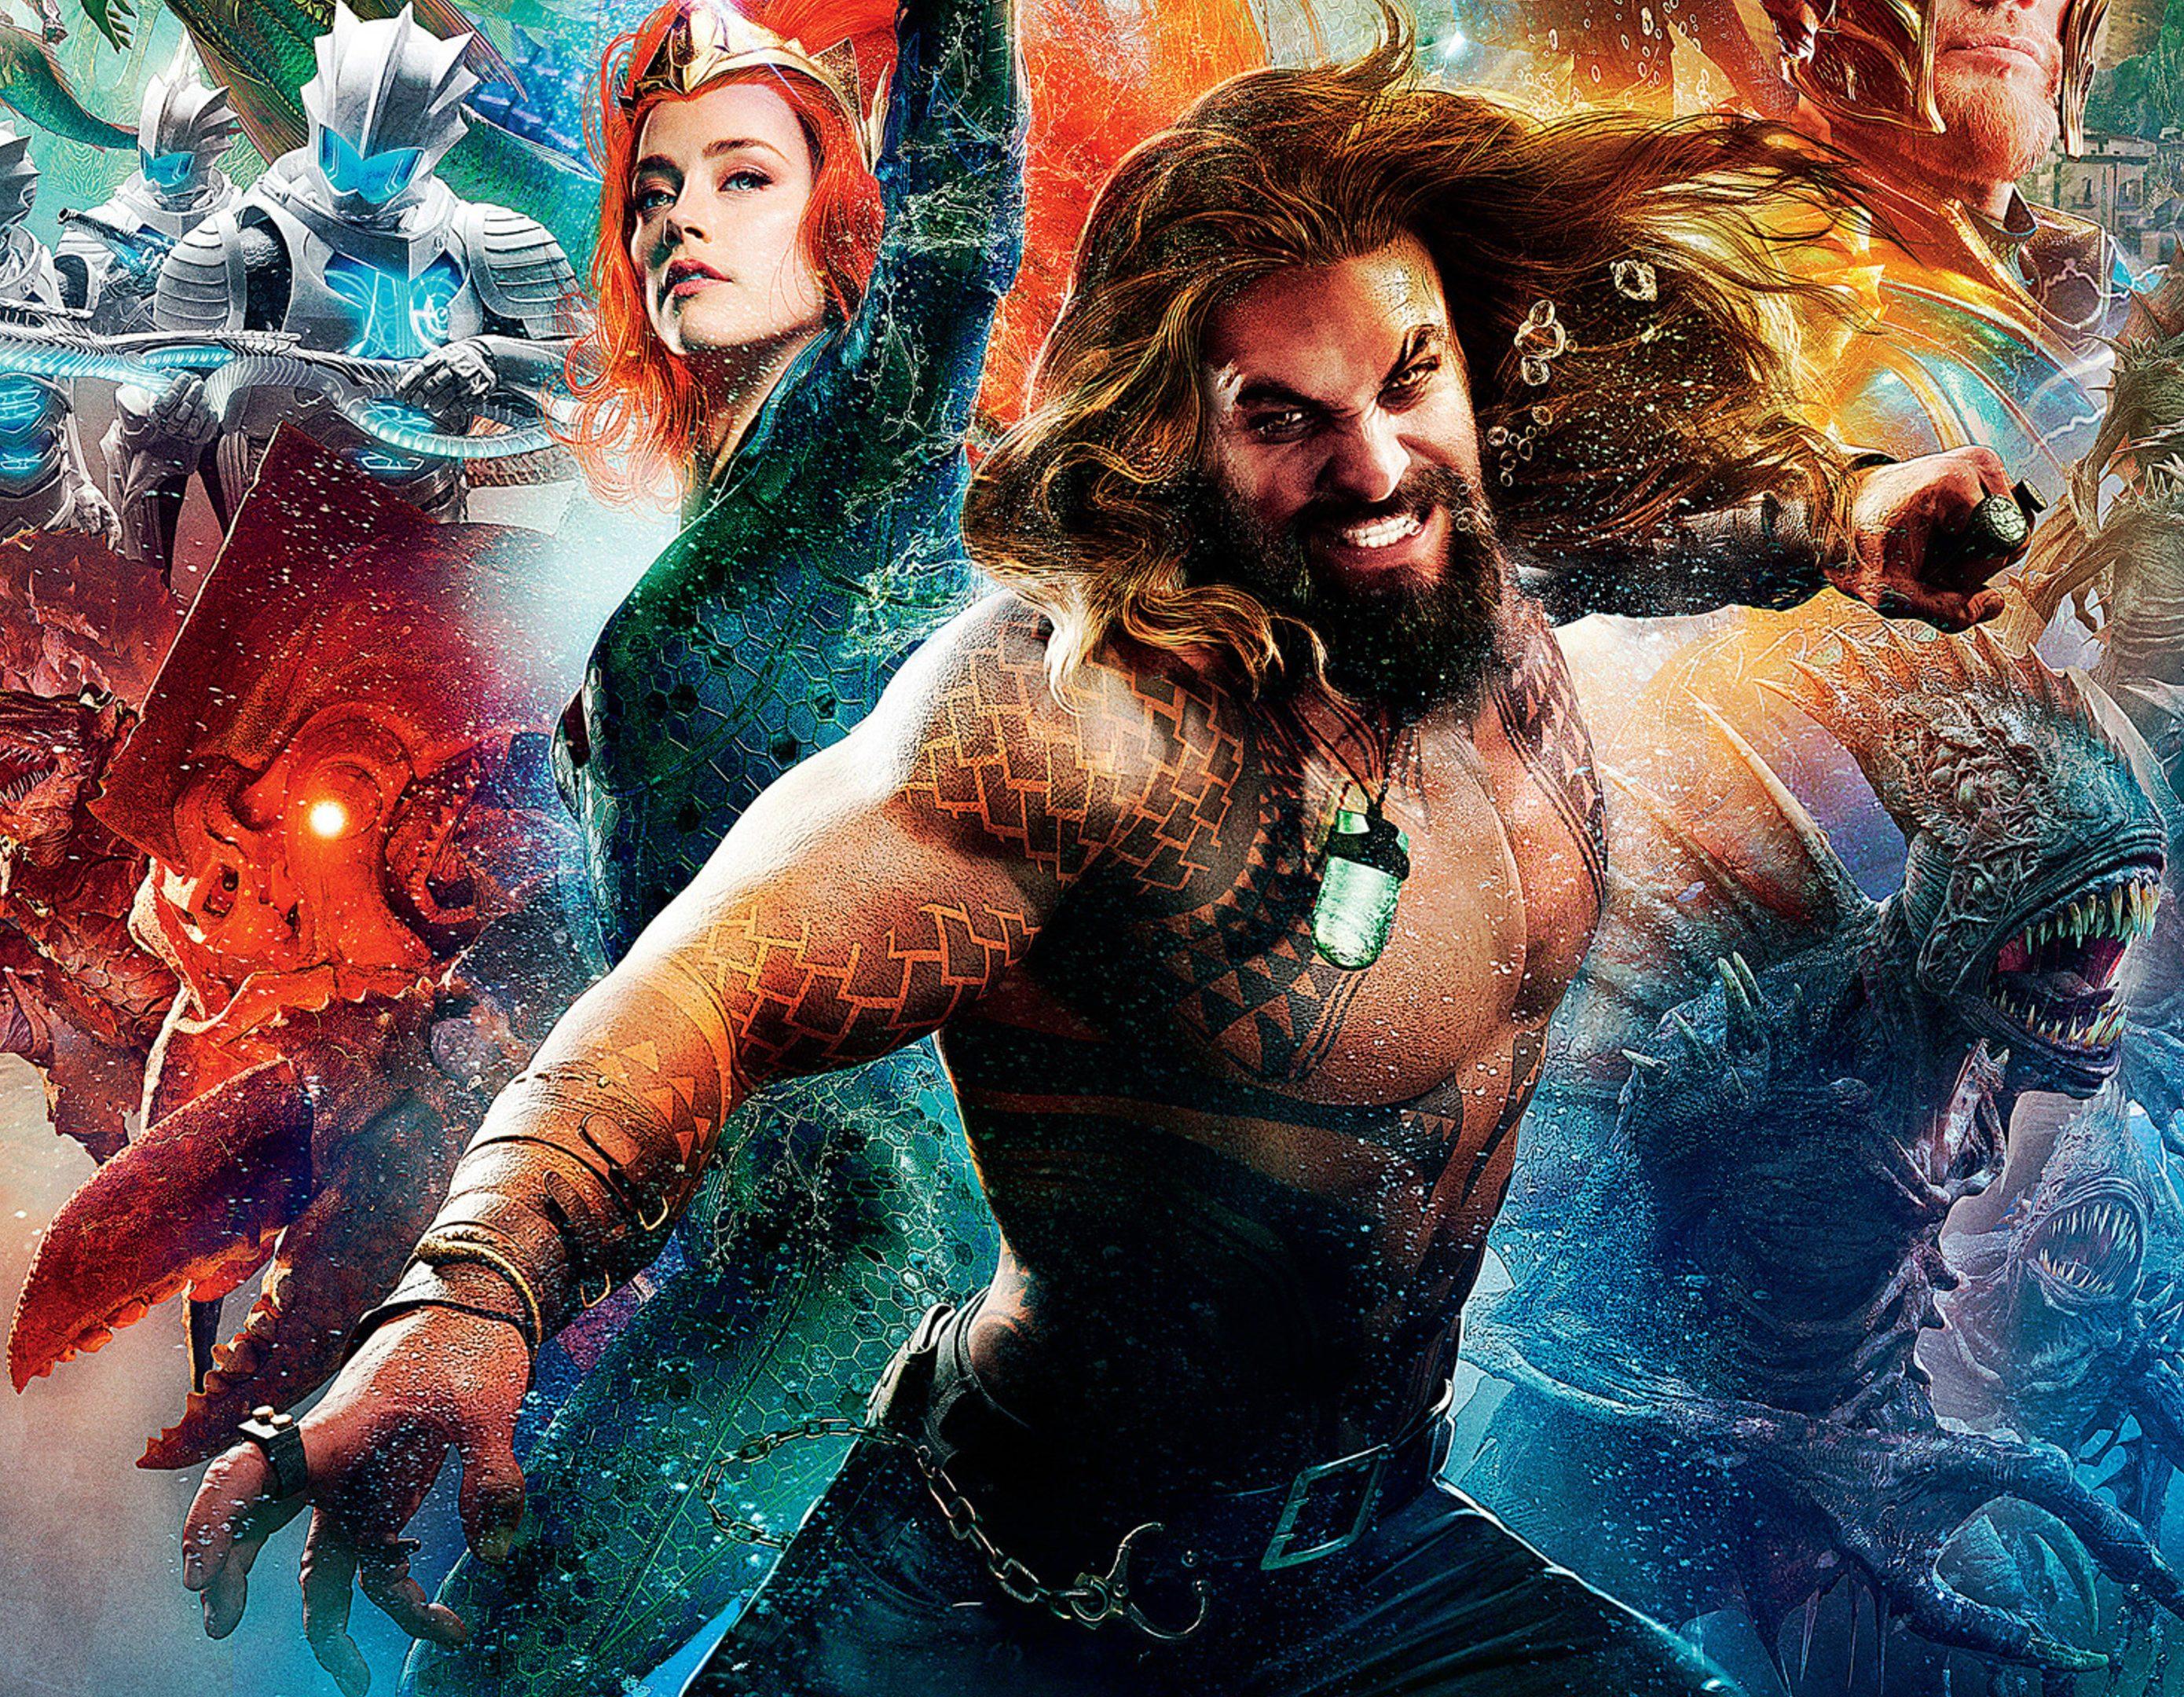 2048x2048 Mera Aquaman Movie Poster Ipad Air Hd 4k: Aquaman 2018 Movie Poster 4K Wallpaper